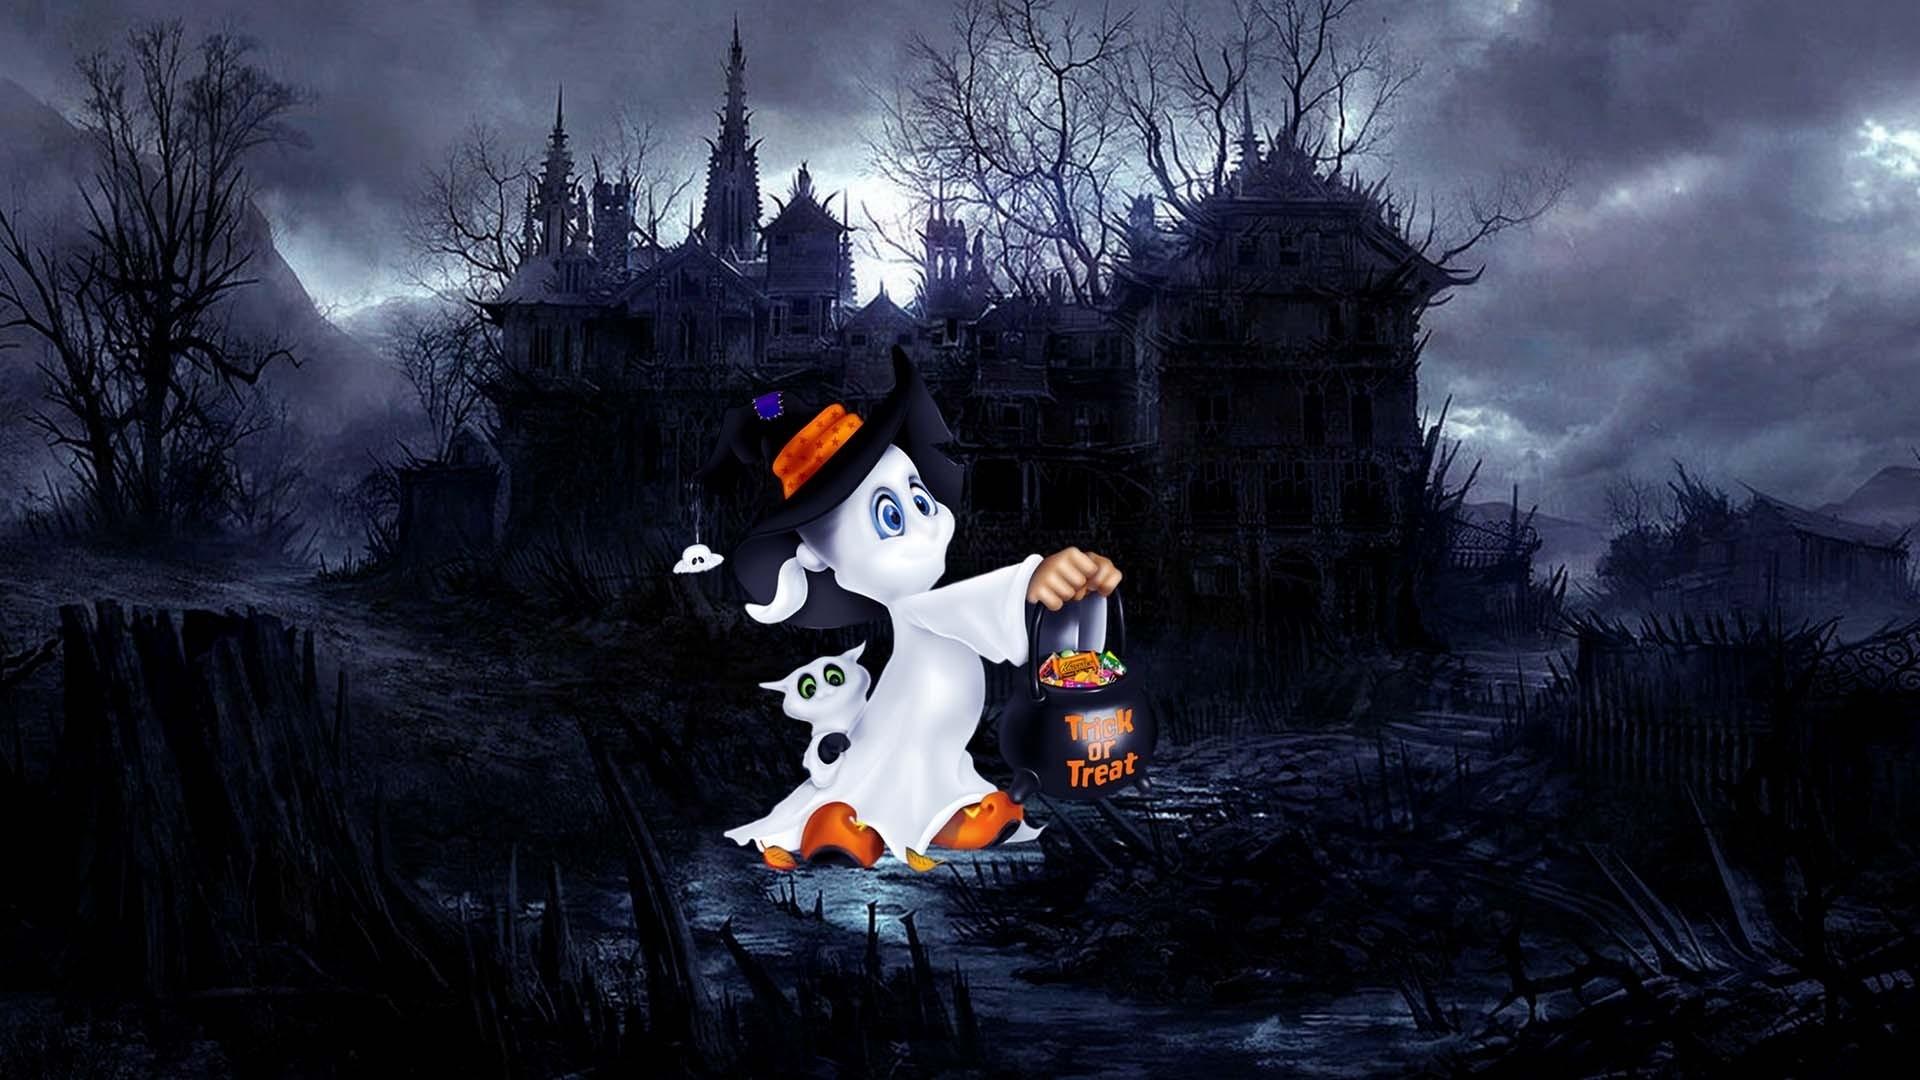 Halloween 2020 Wallpaper image hd